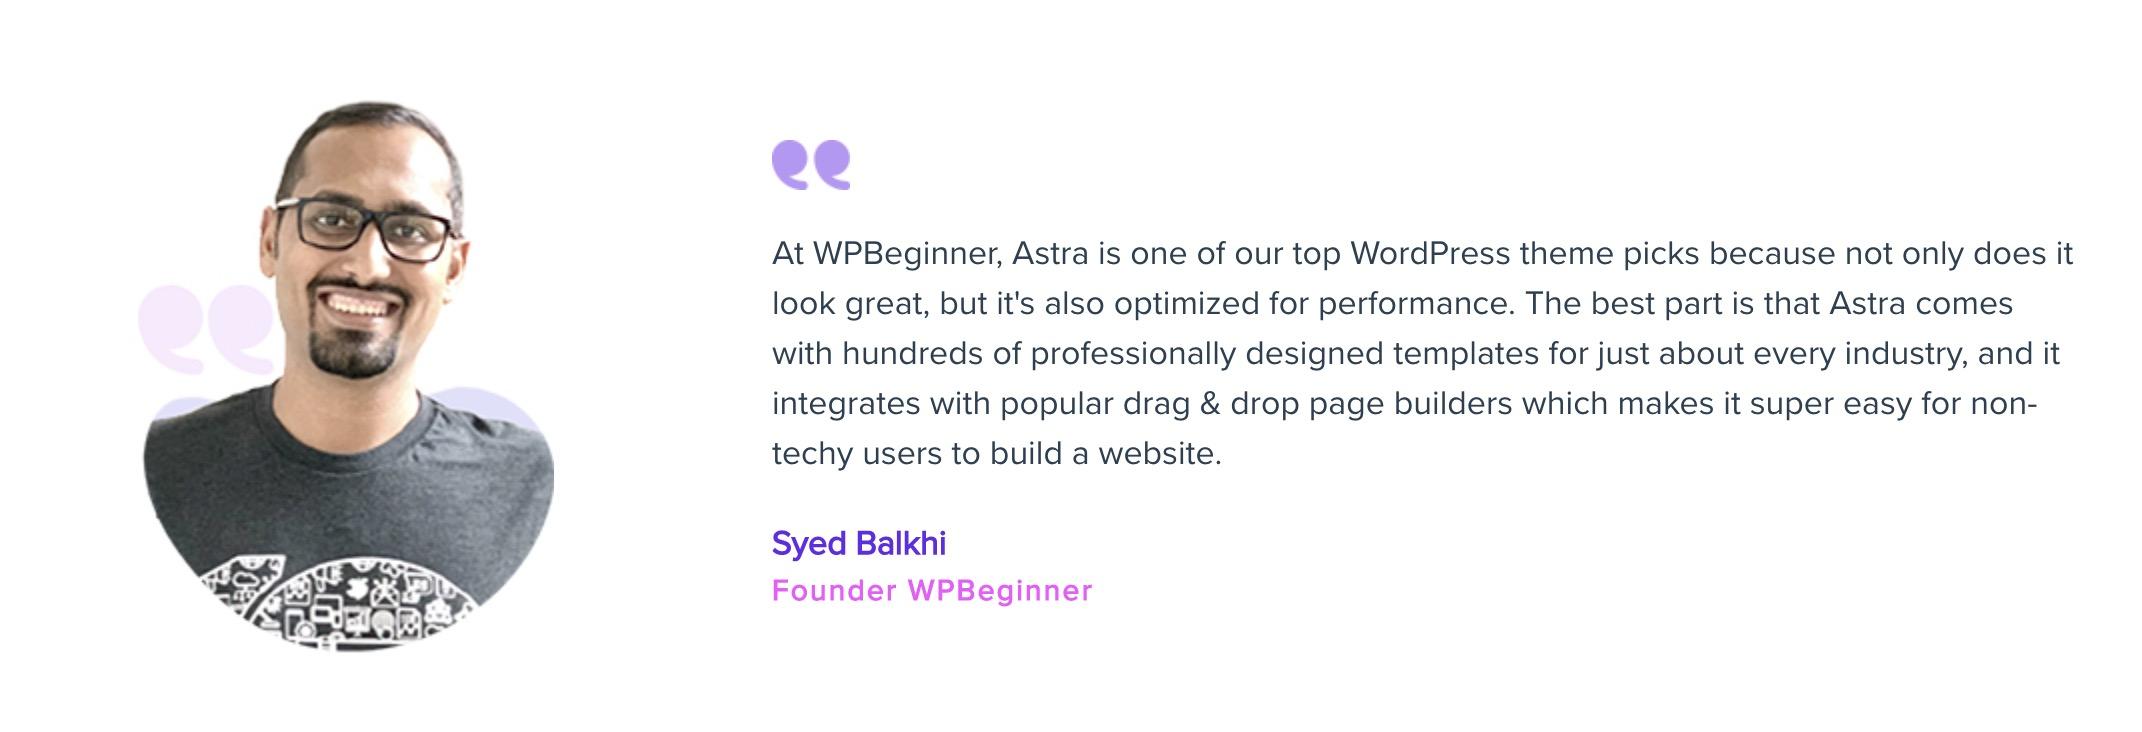 Astra testimonial - Syed Balkhi